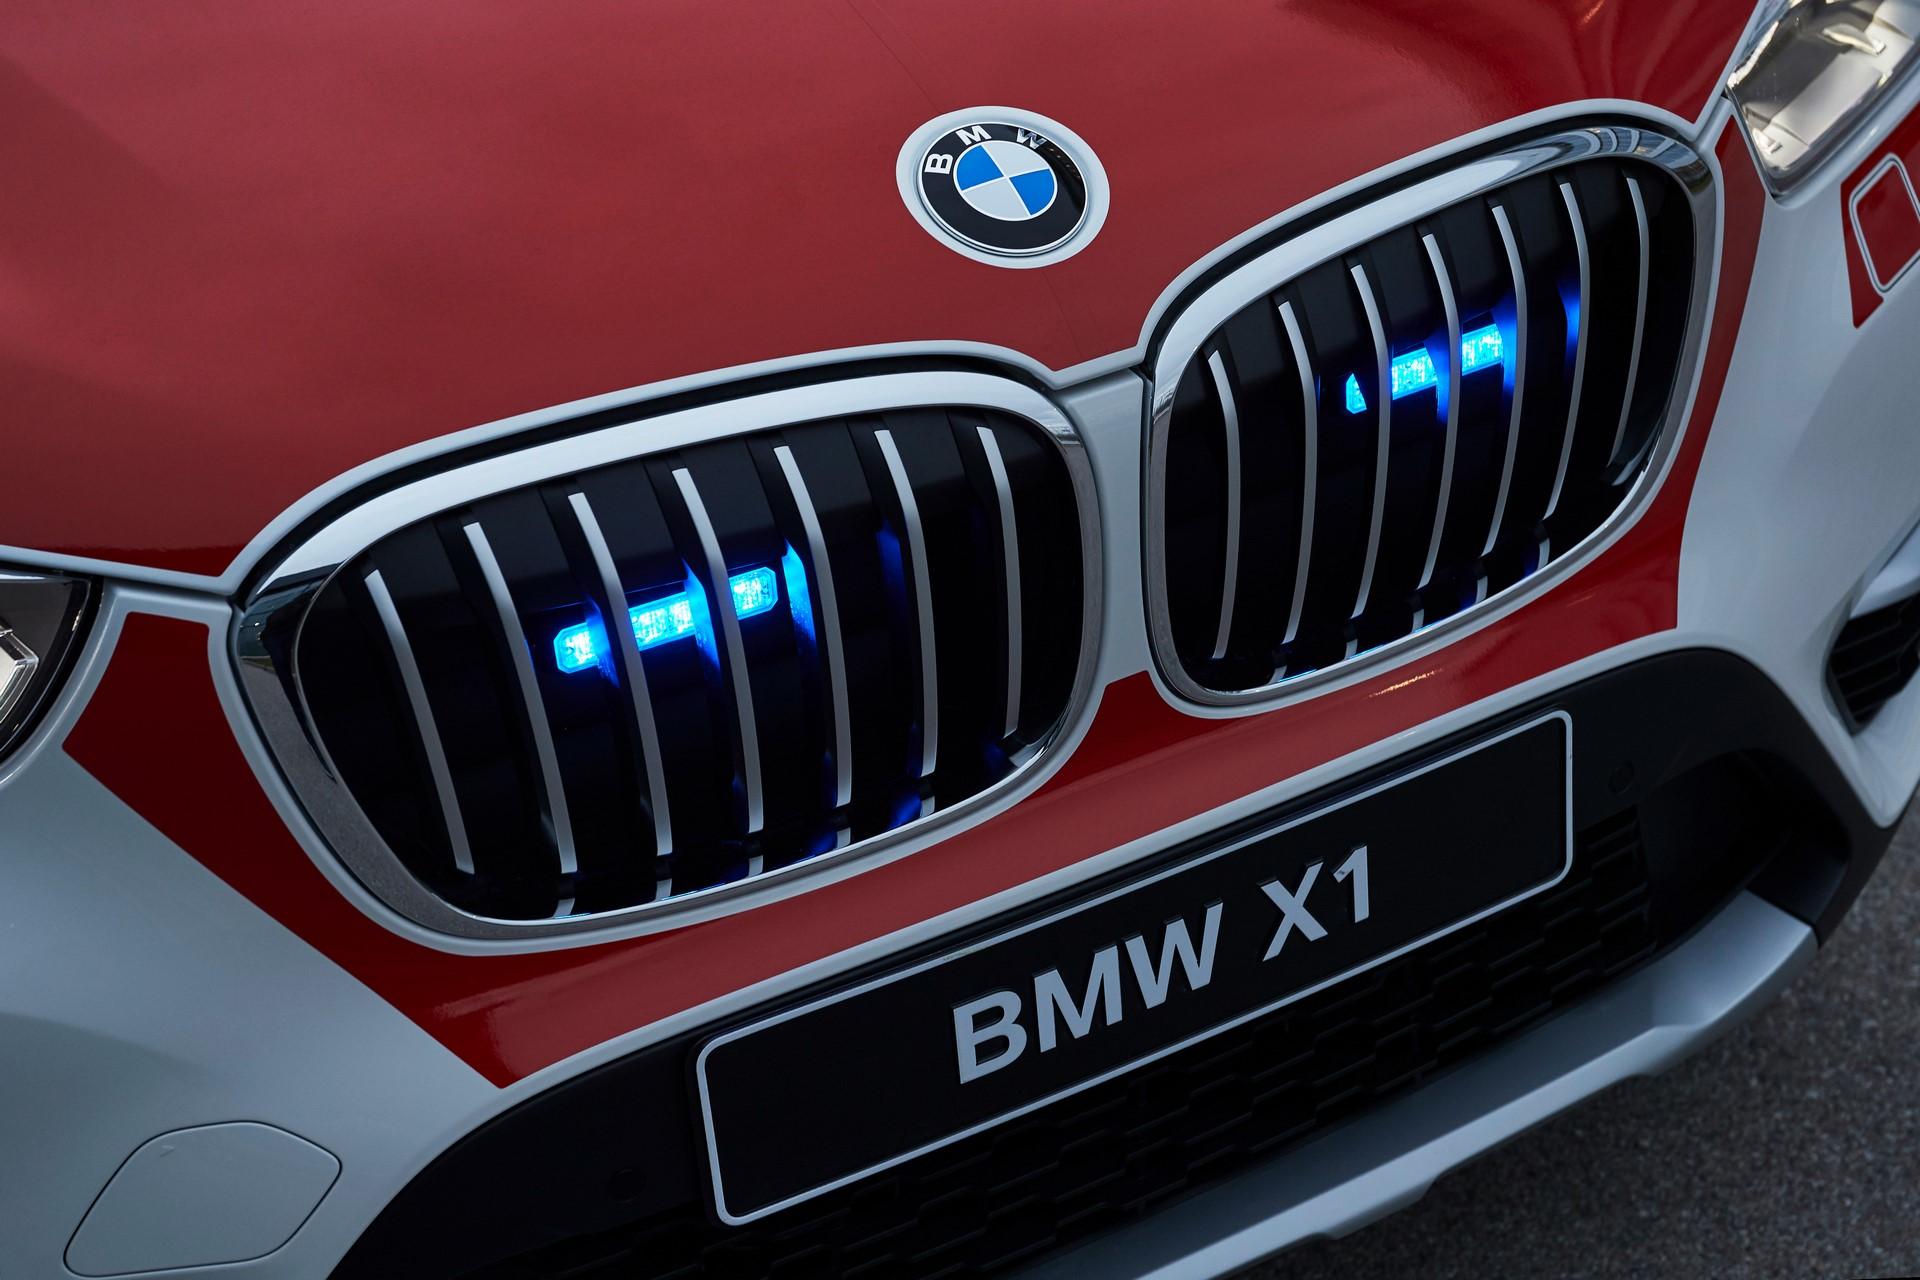 BMW-RETTmobil-2019-31